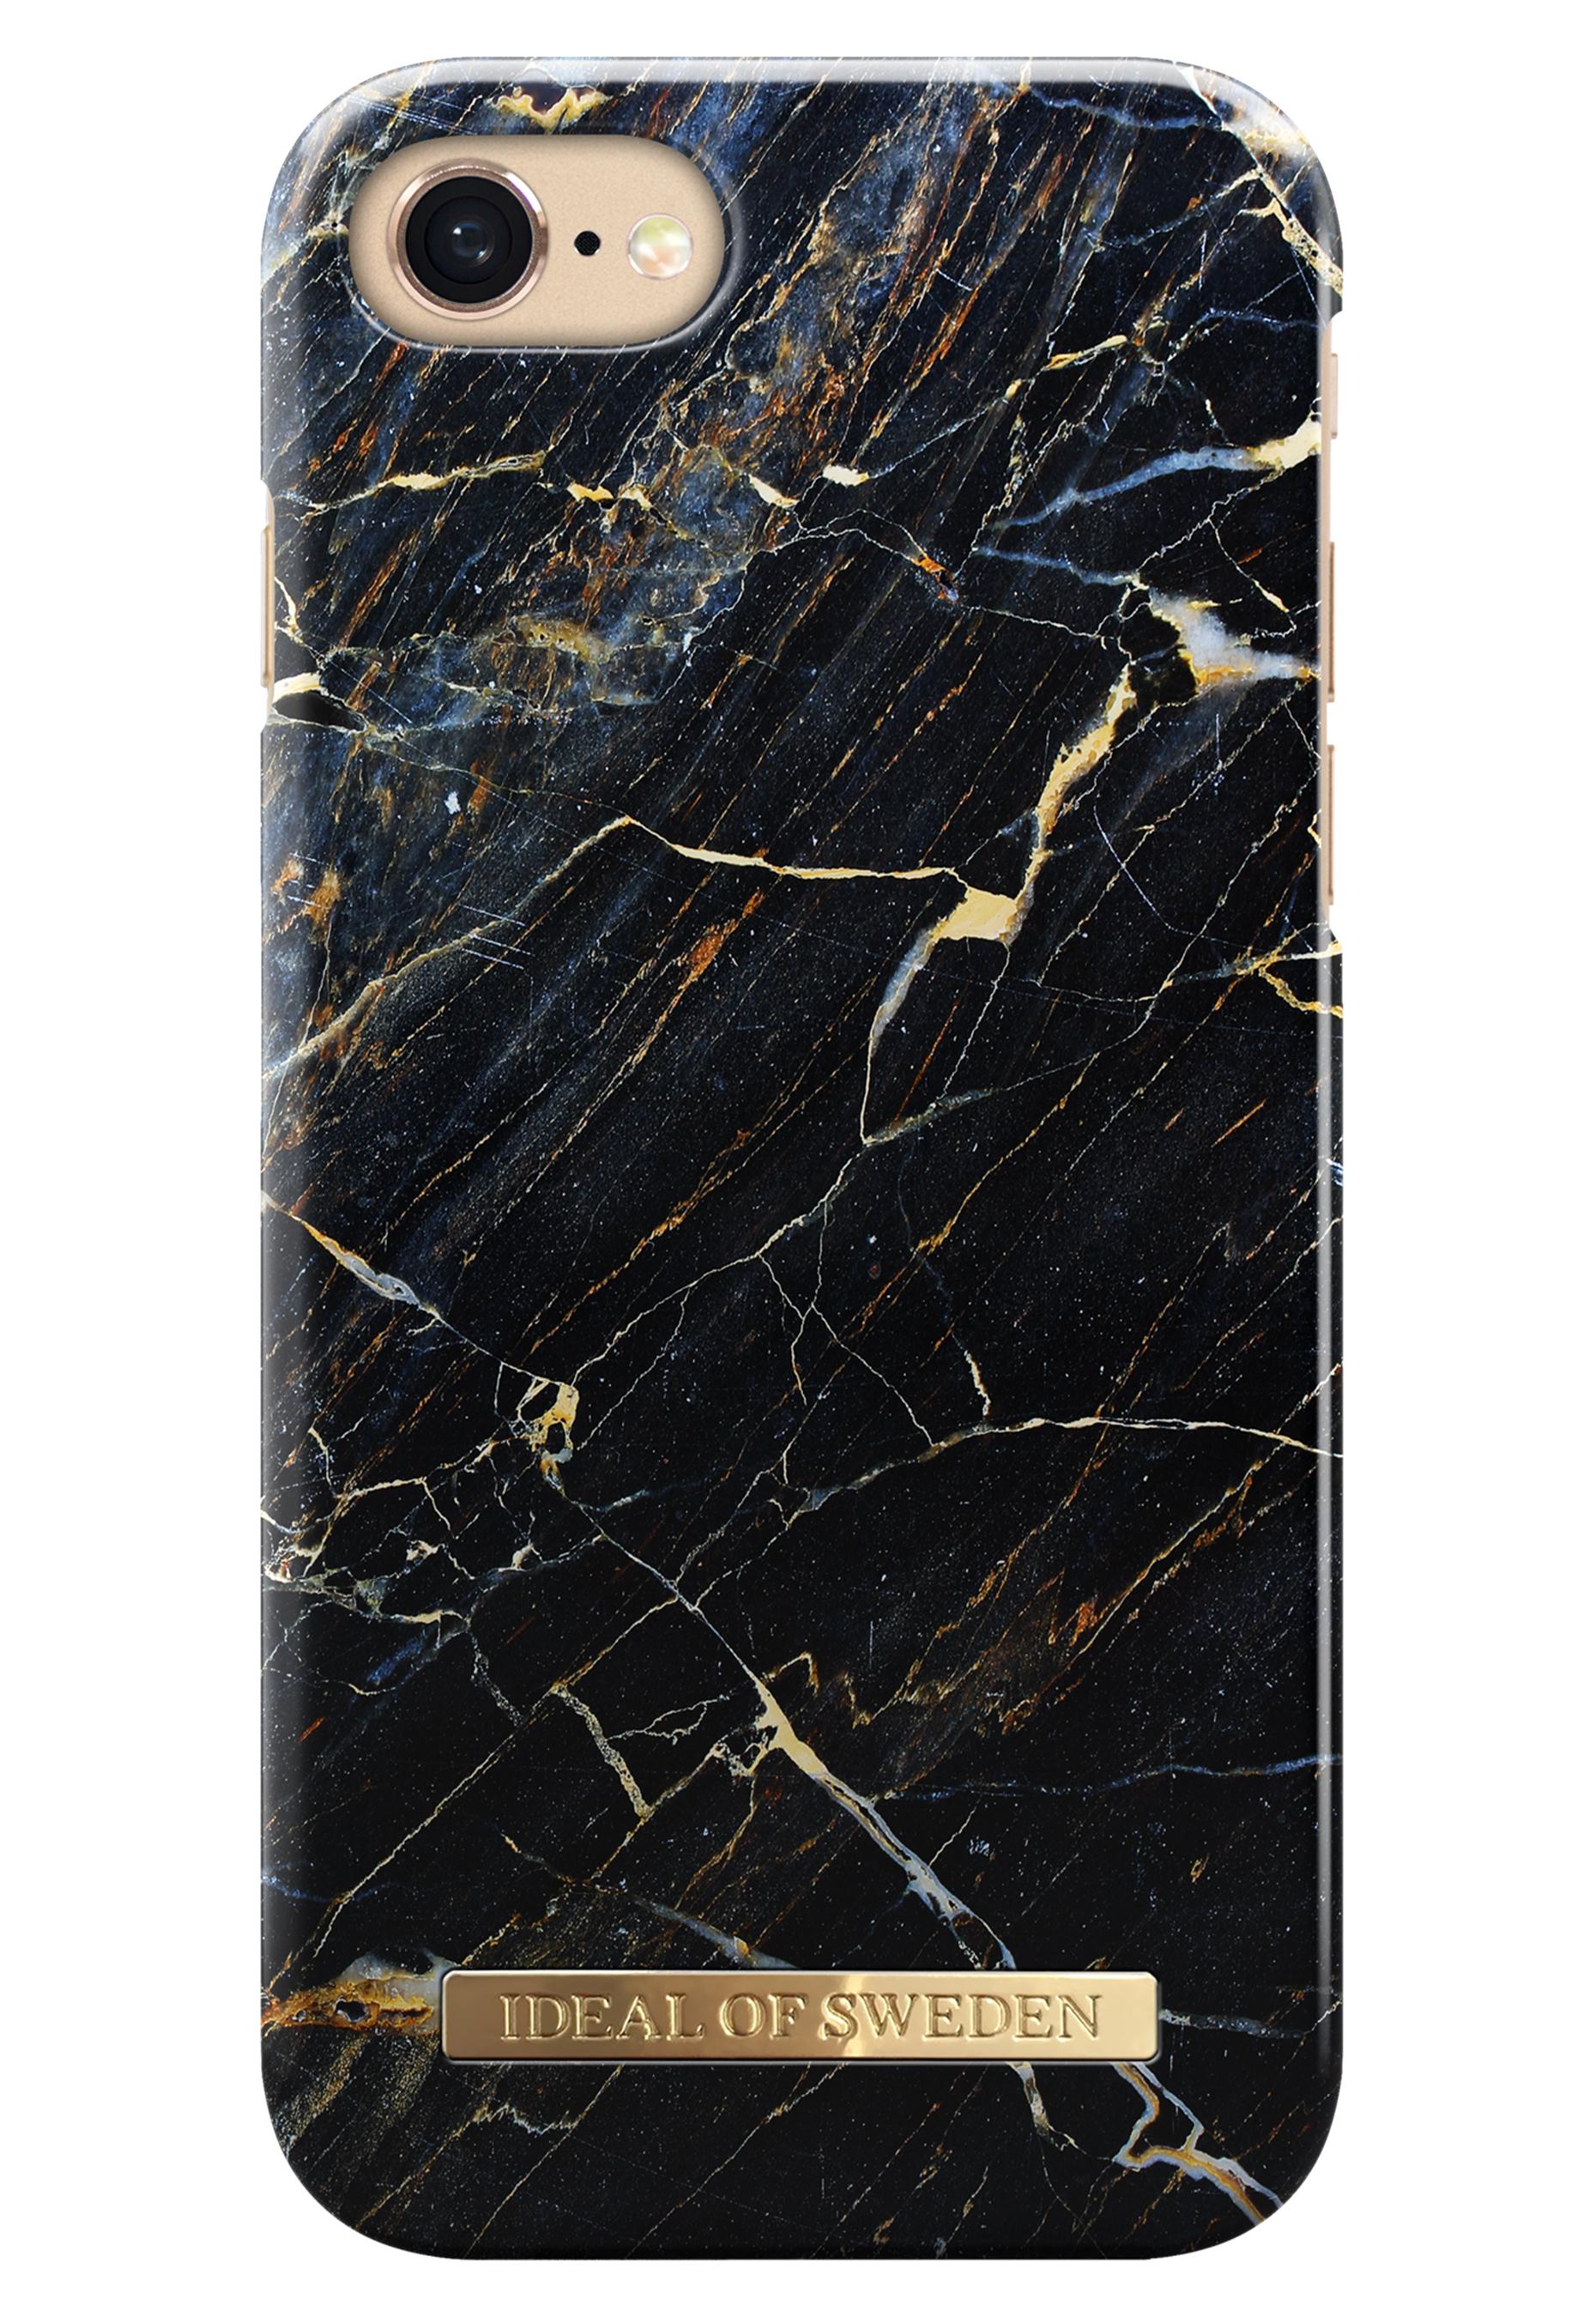 iDeal Of Sweden Fashion Case iPhone Port Laurent Marble - Bubbleroom 5c59599b28ac1